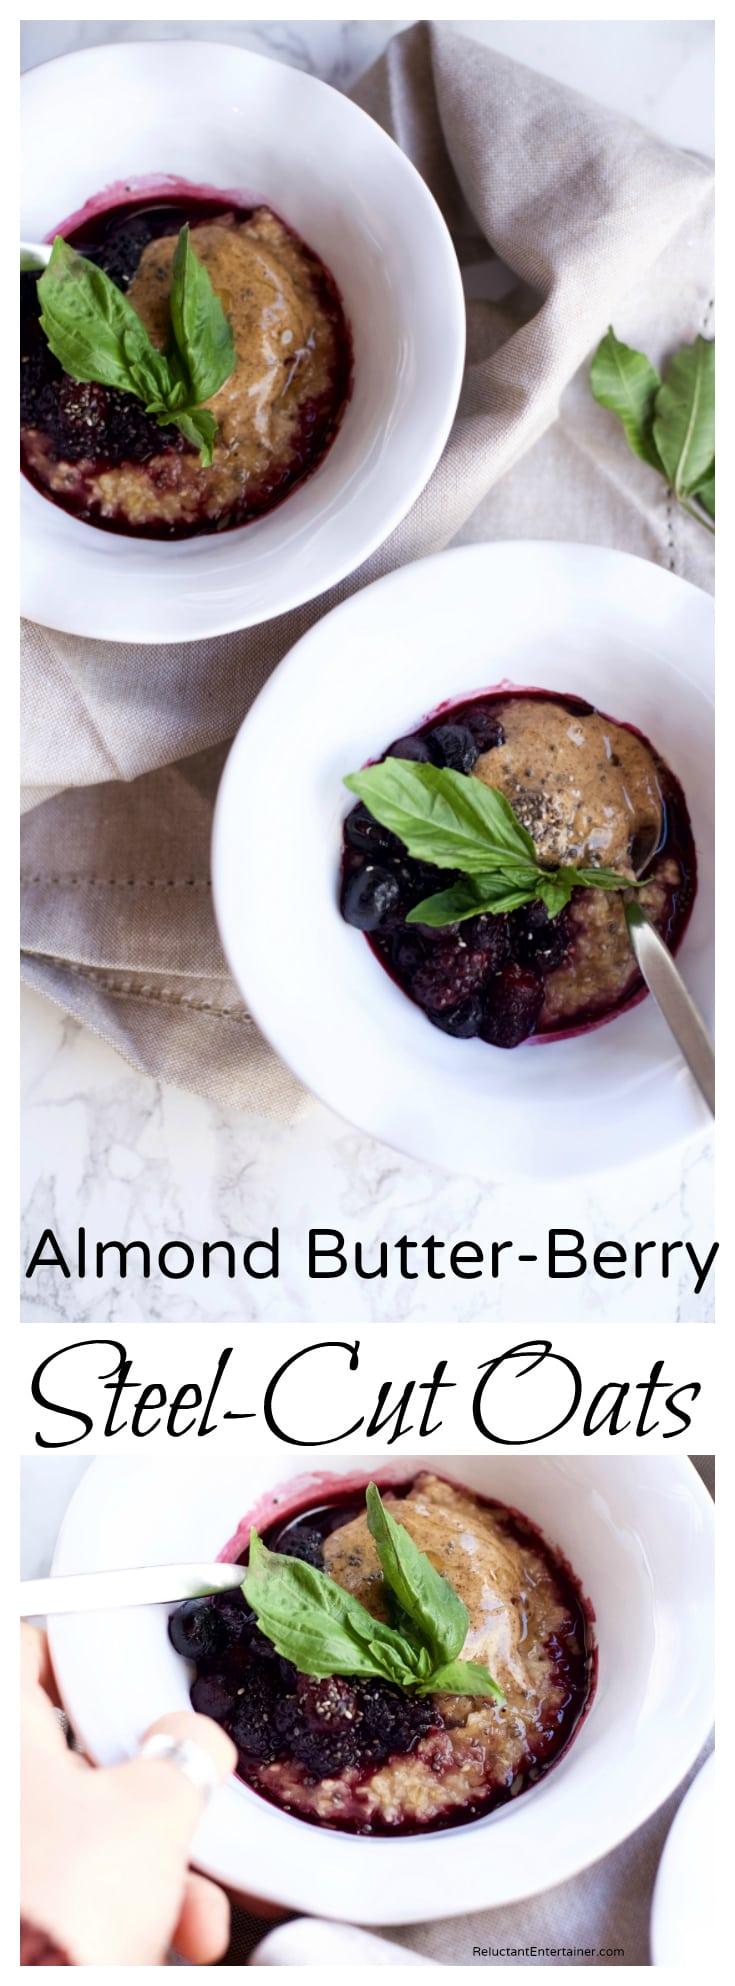 Almond Butter Berry Steel-Cut Oats